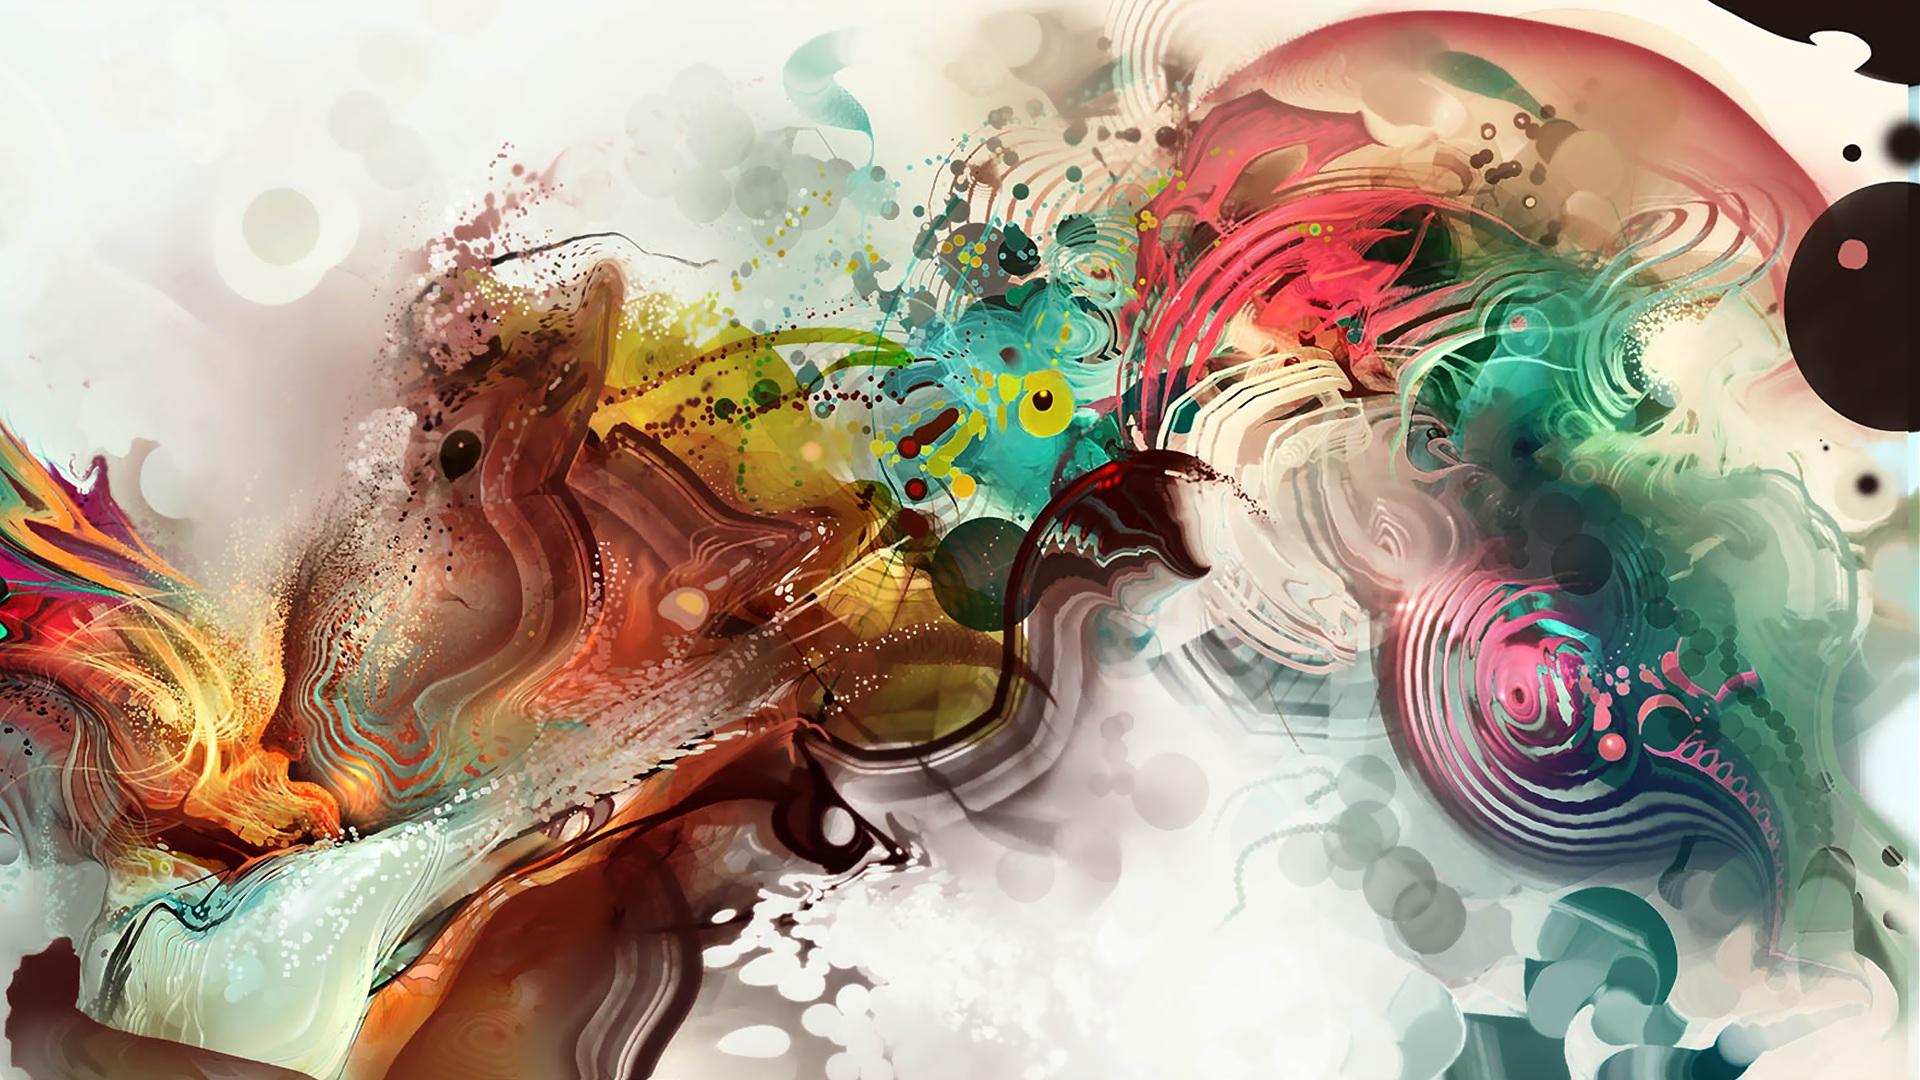 digital hd Artistic Wallpapers